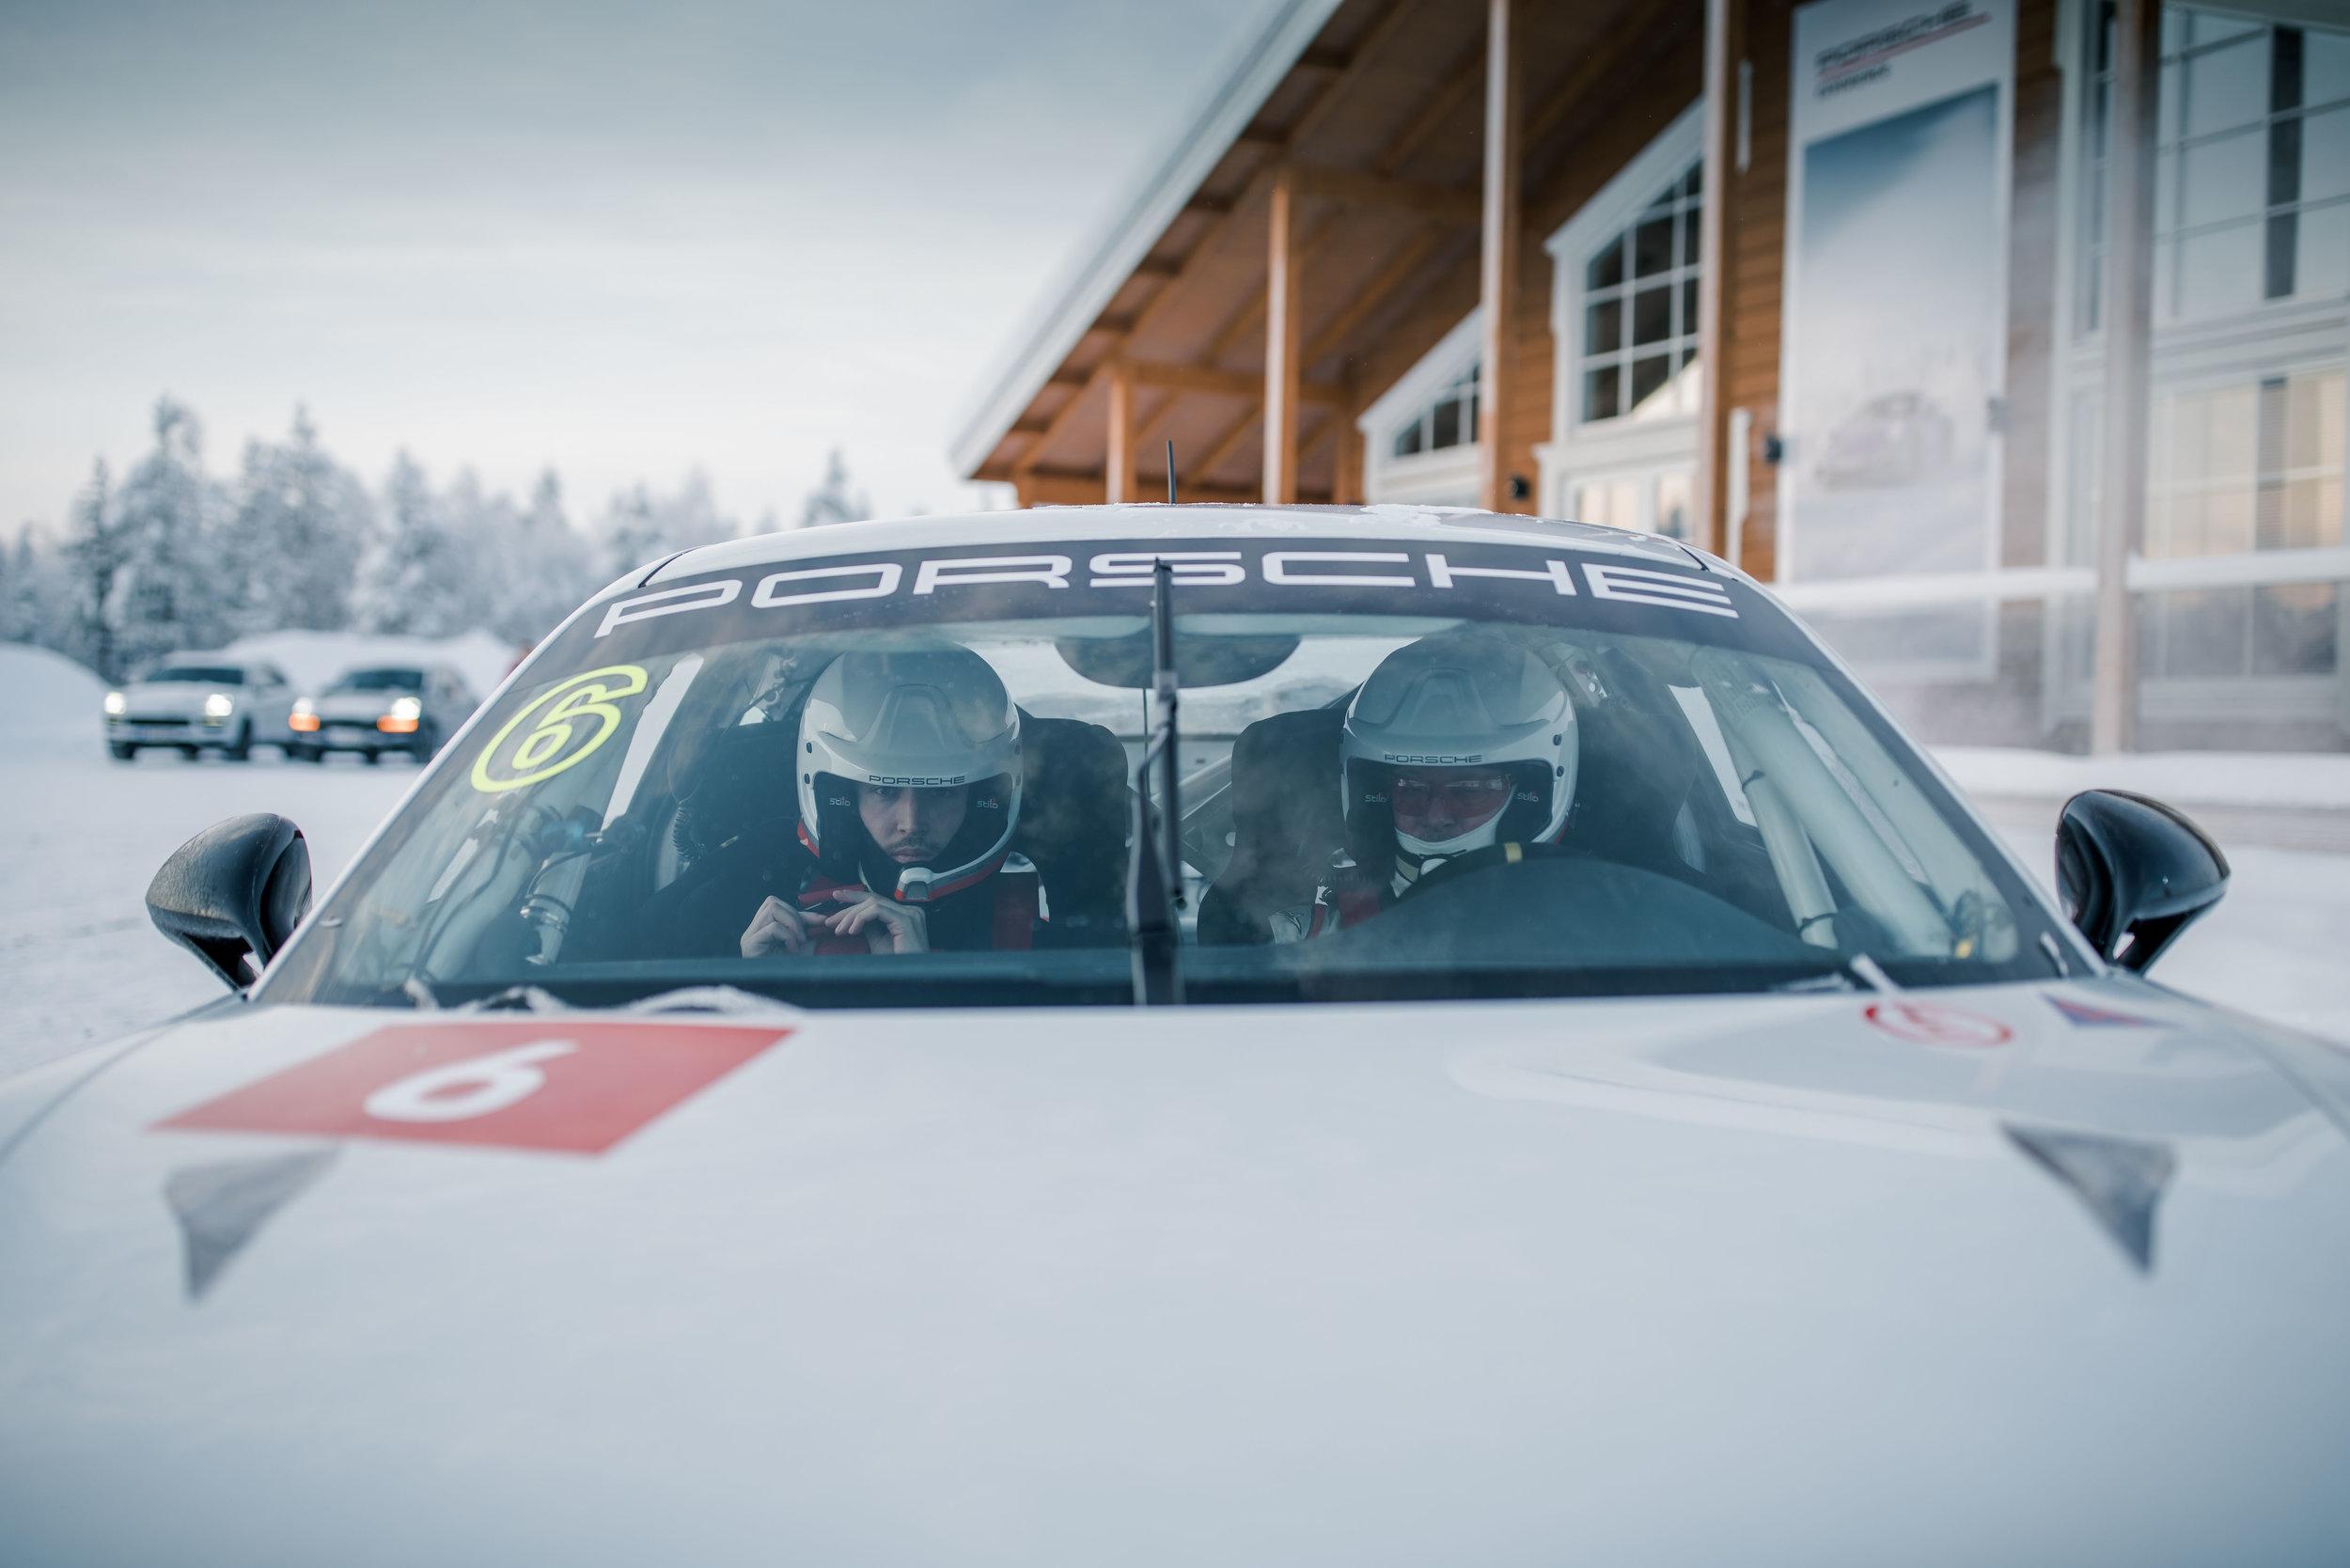 Porsche Ice Experience on Ice_30_01_2019_0969_175763.jpg